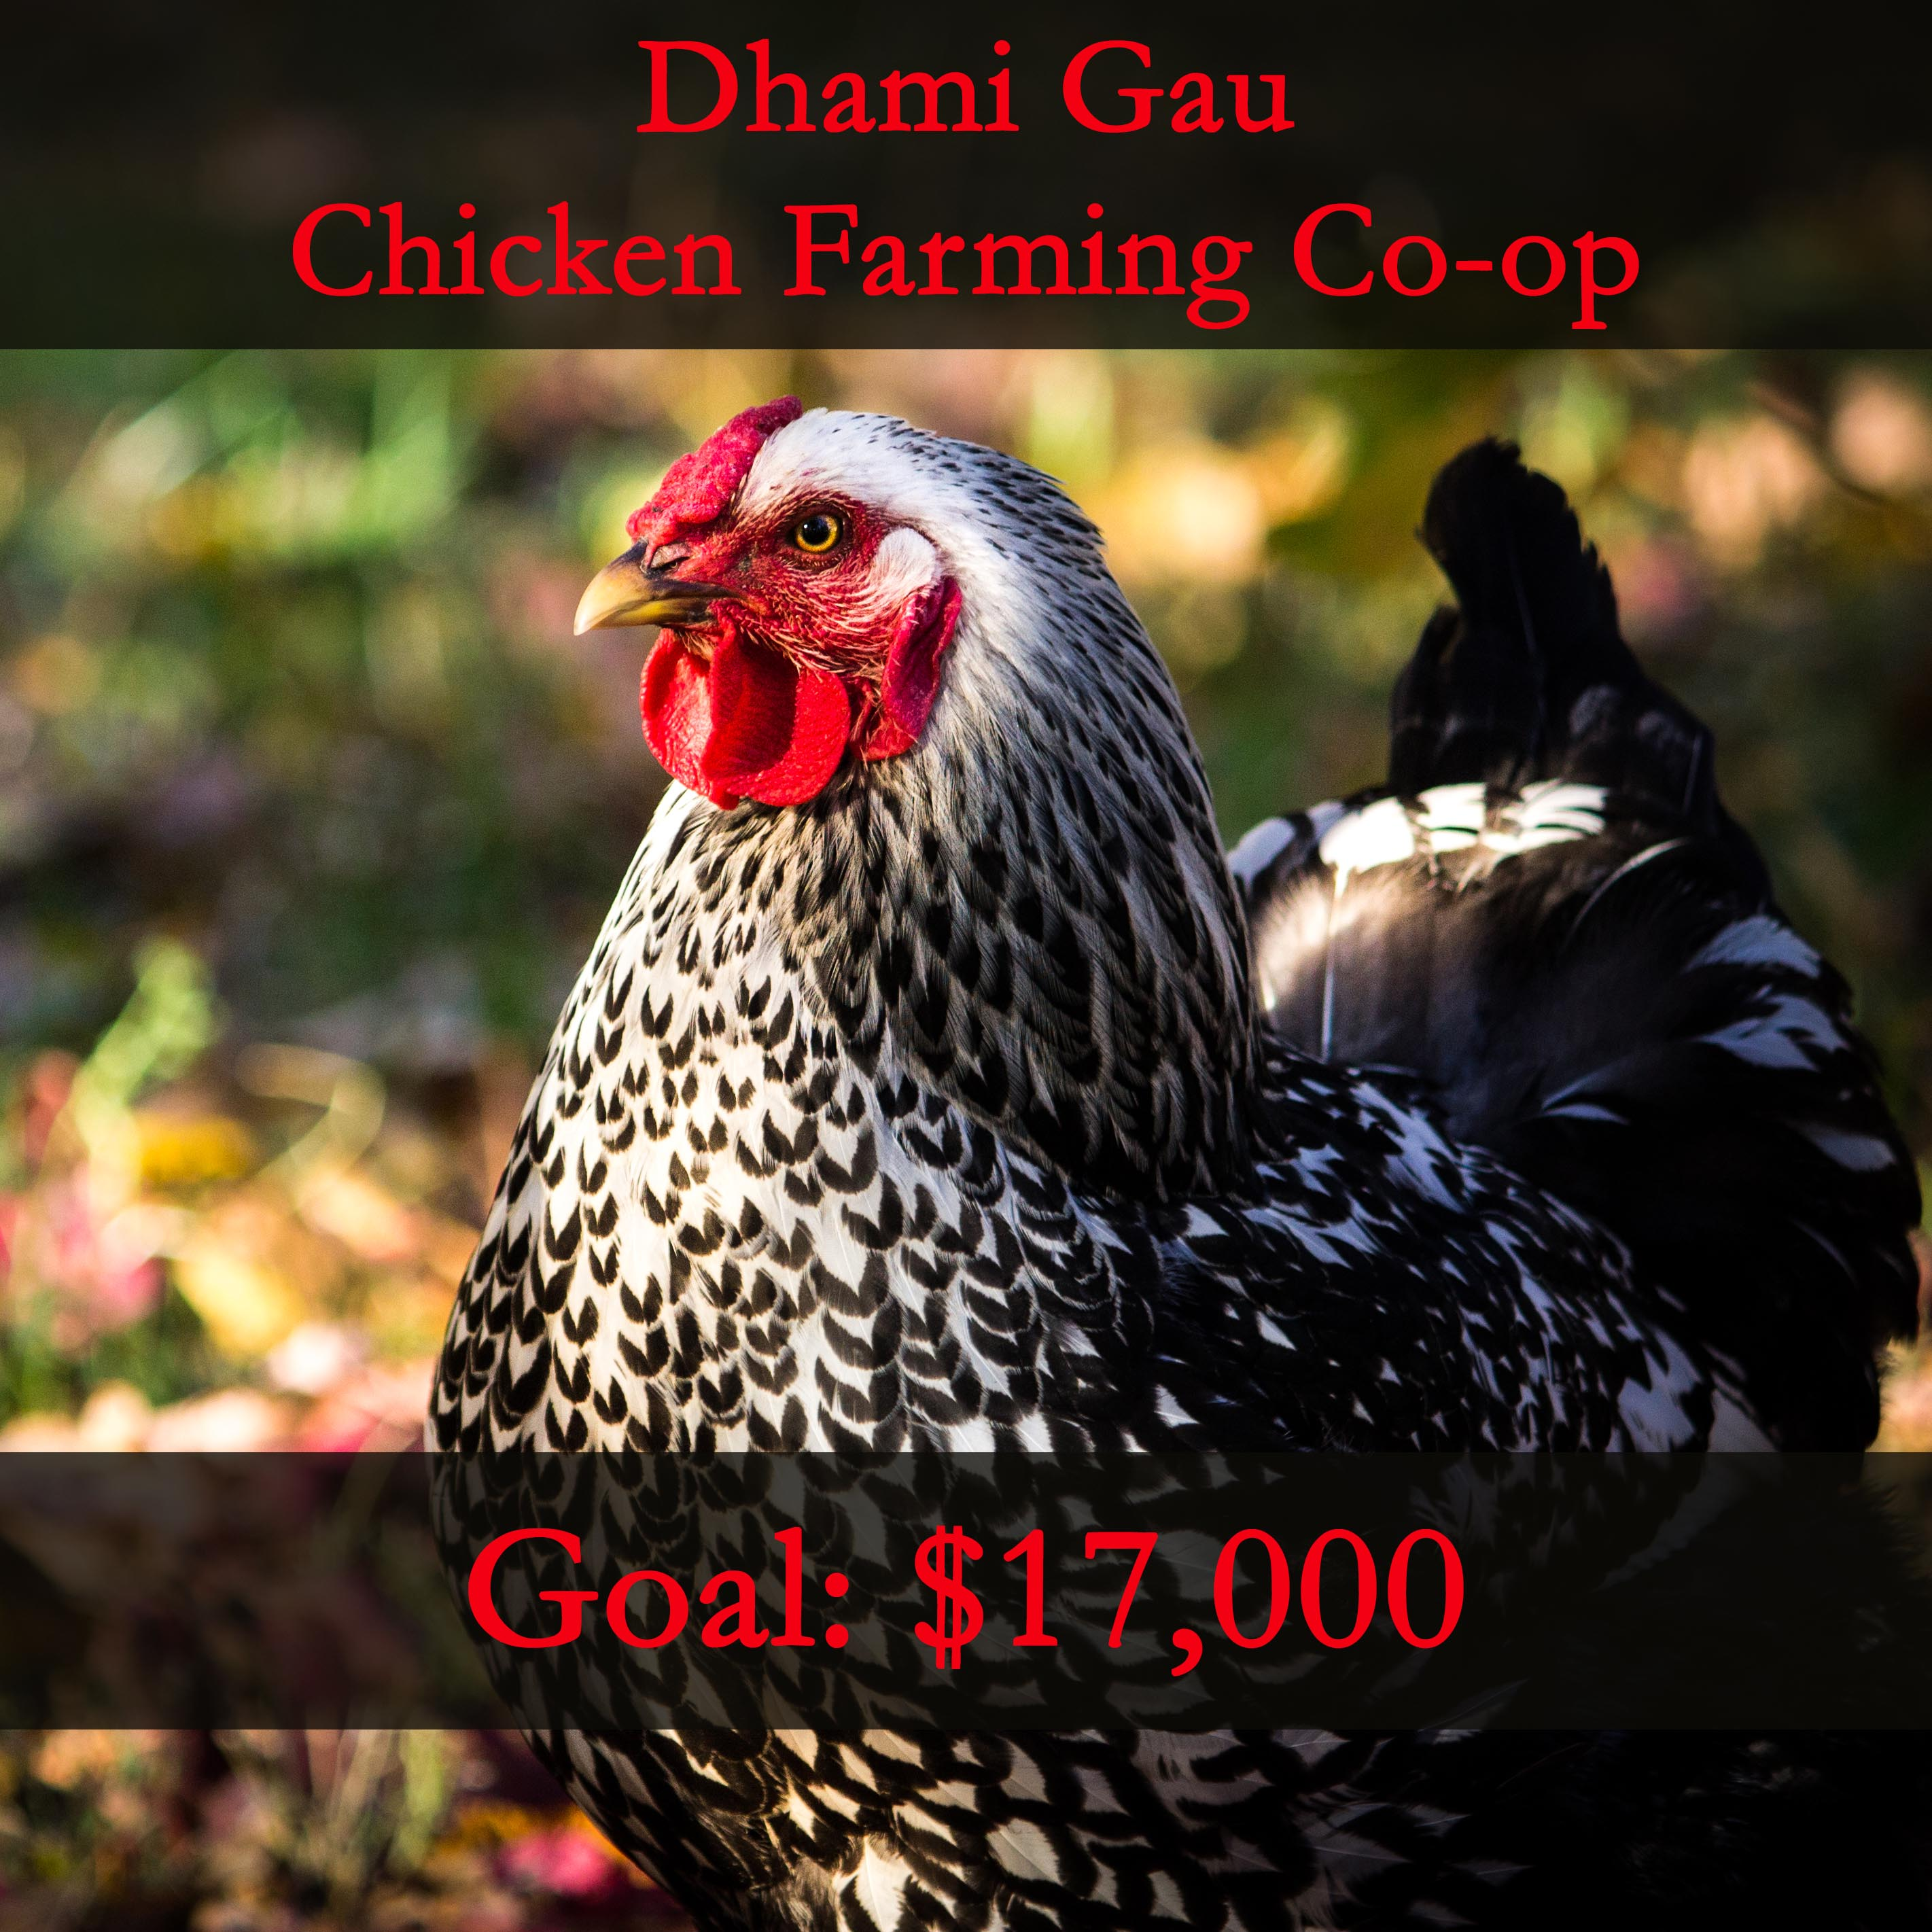 Help Build a Chicken Farm